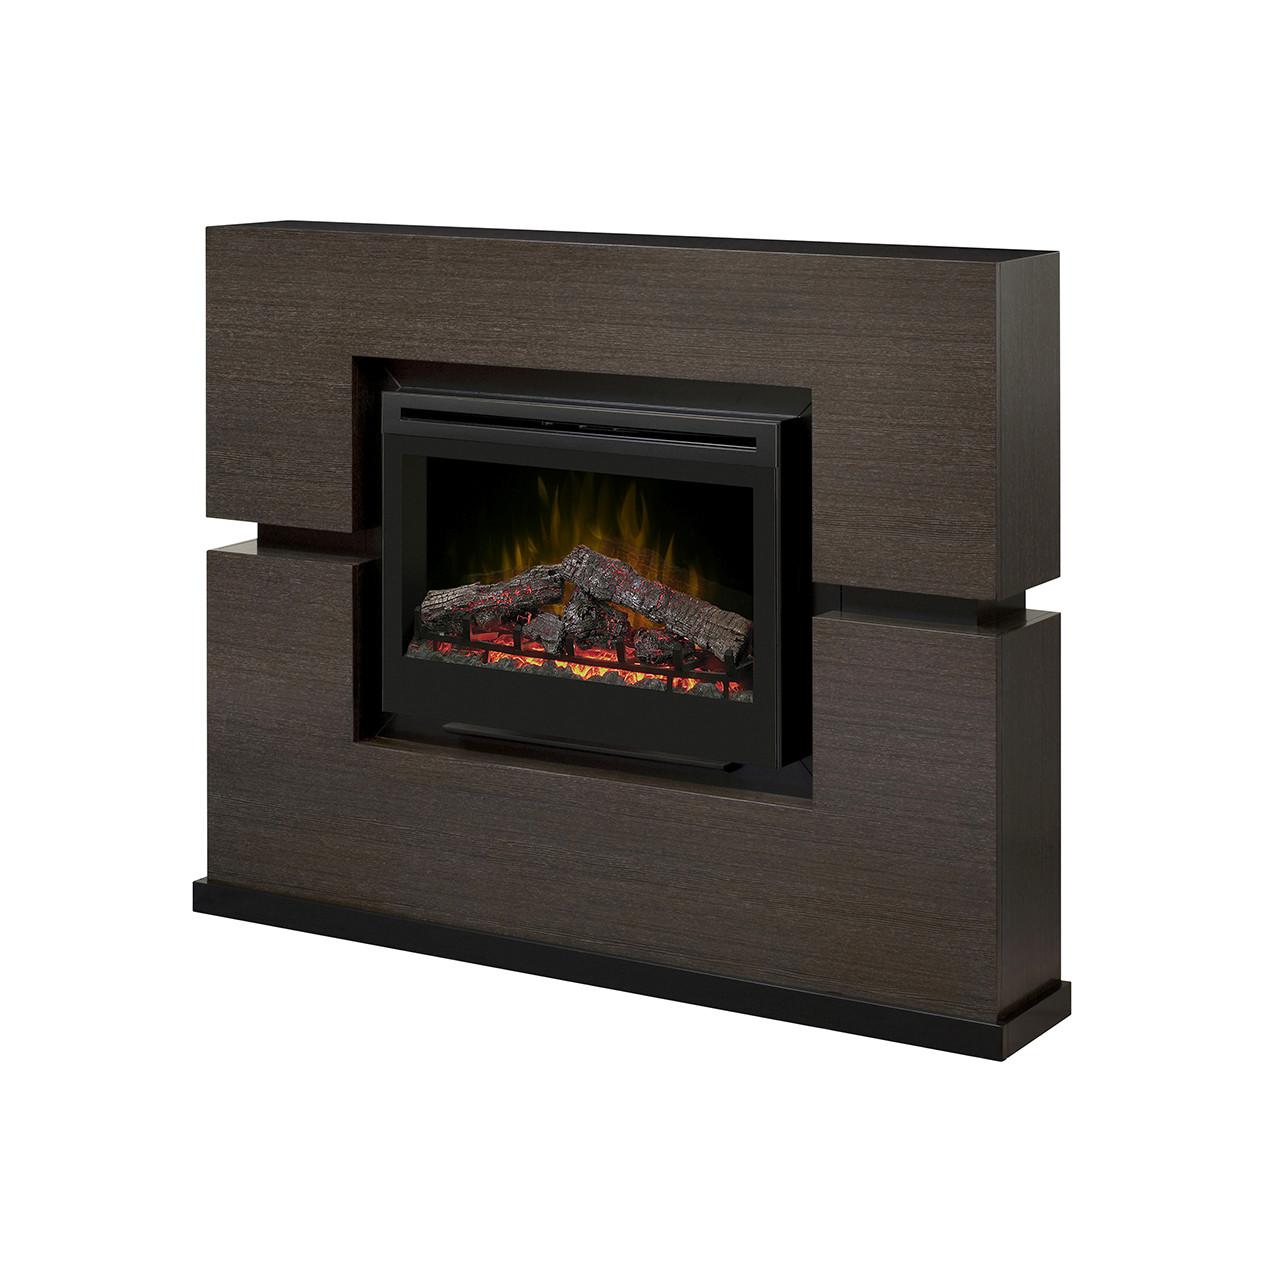 Dimplex Linwood Electric Fireplace - Walmart.com